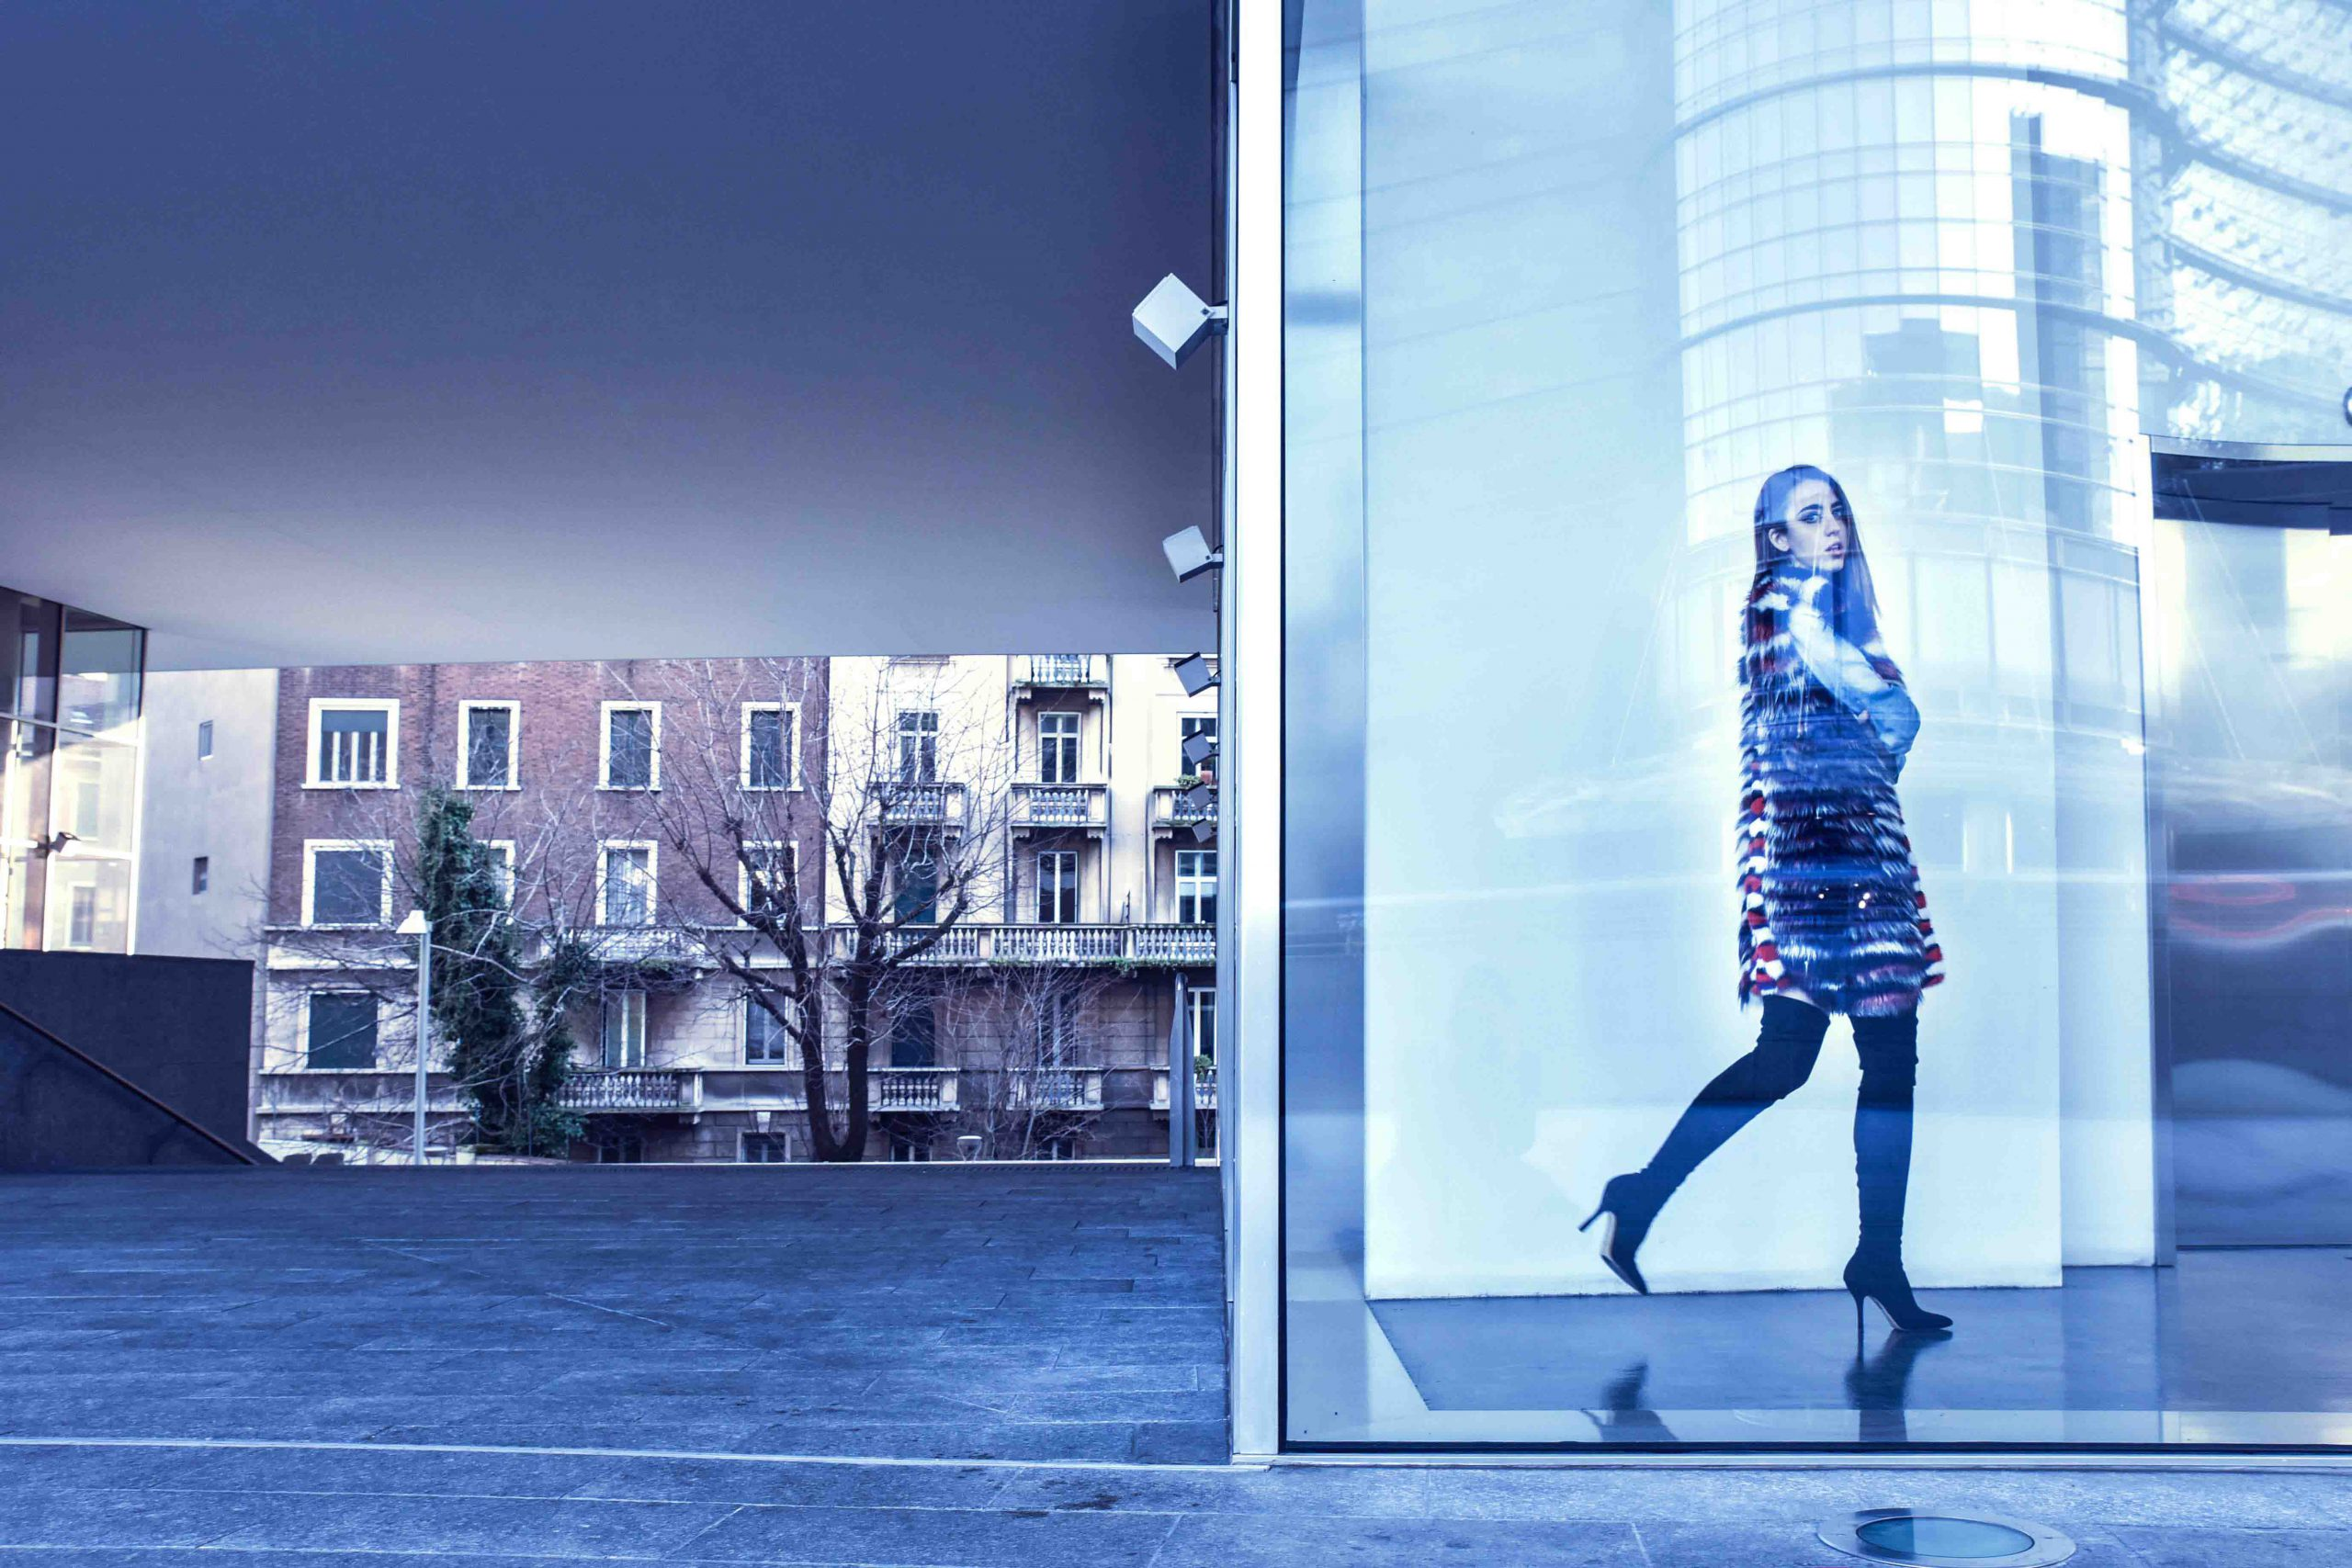 new york fashion week 2015 pelliccia di visone vladimiro lady fur gioia